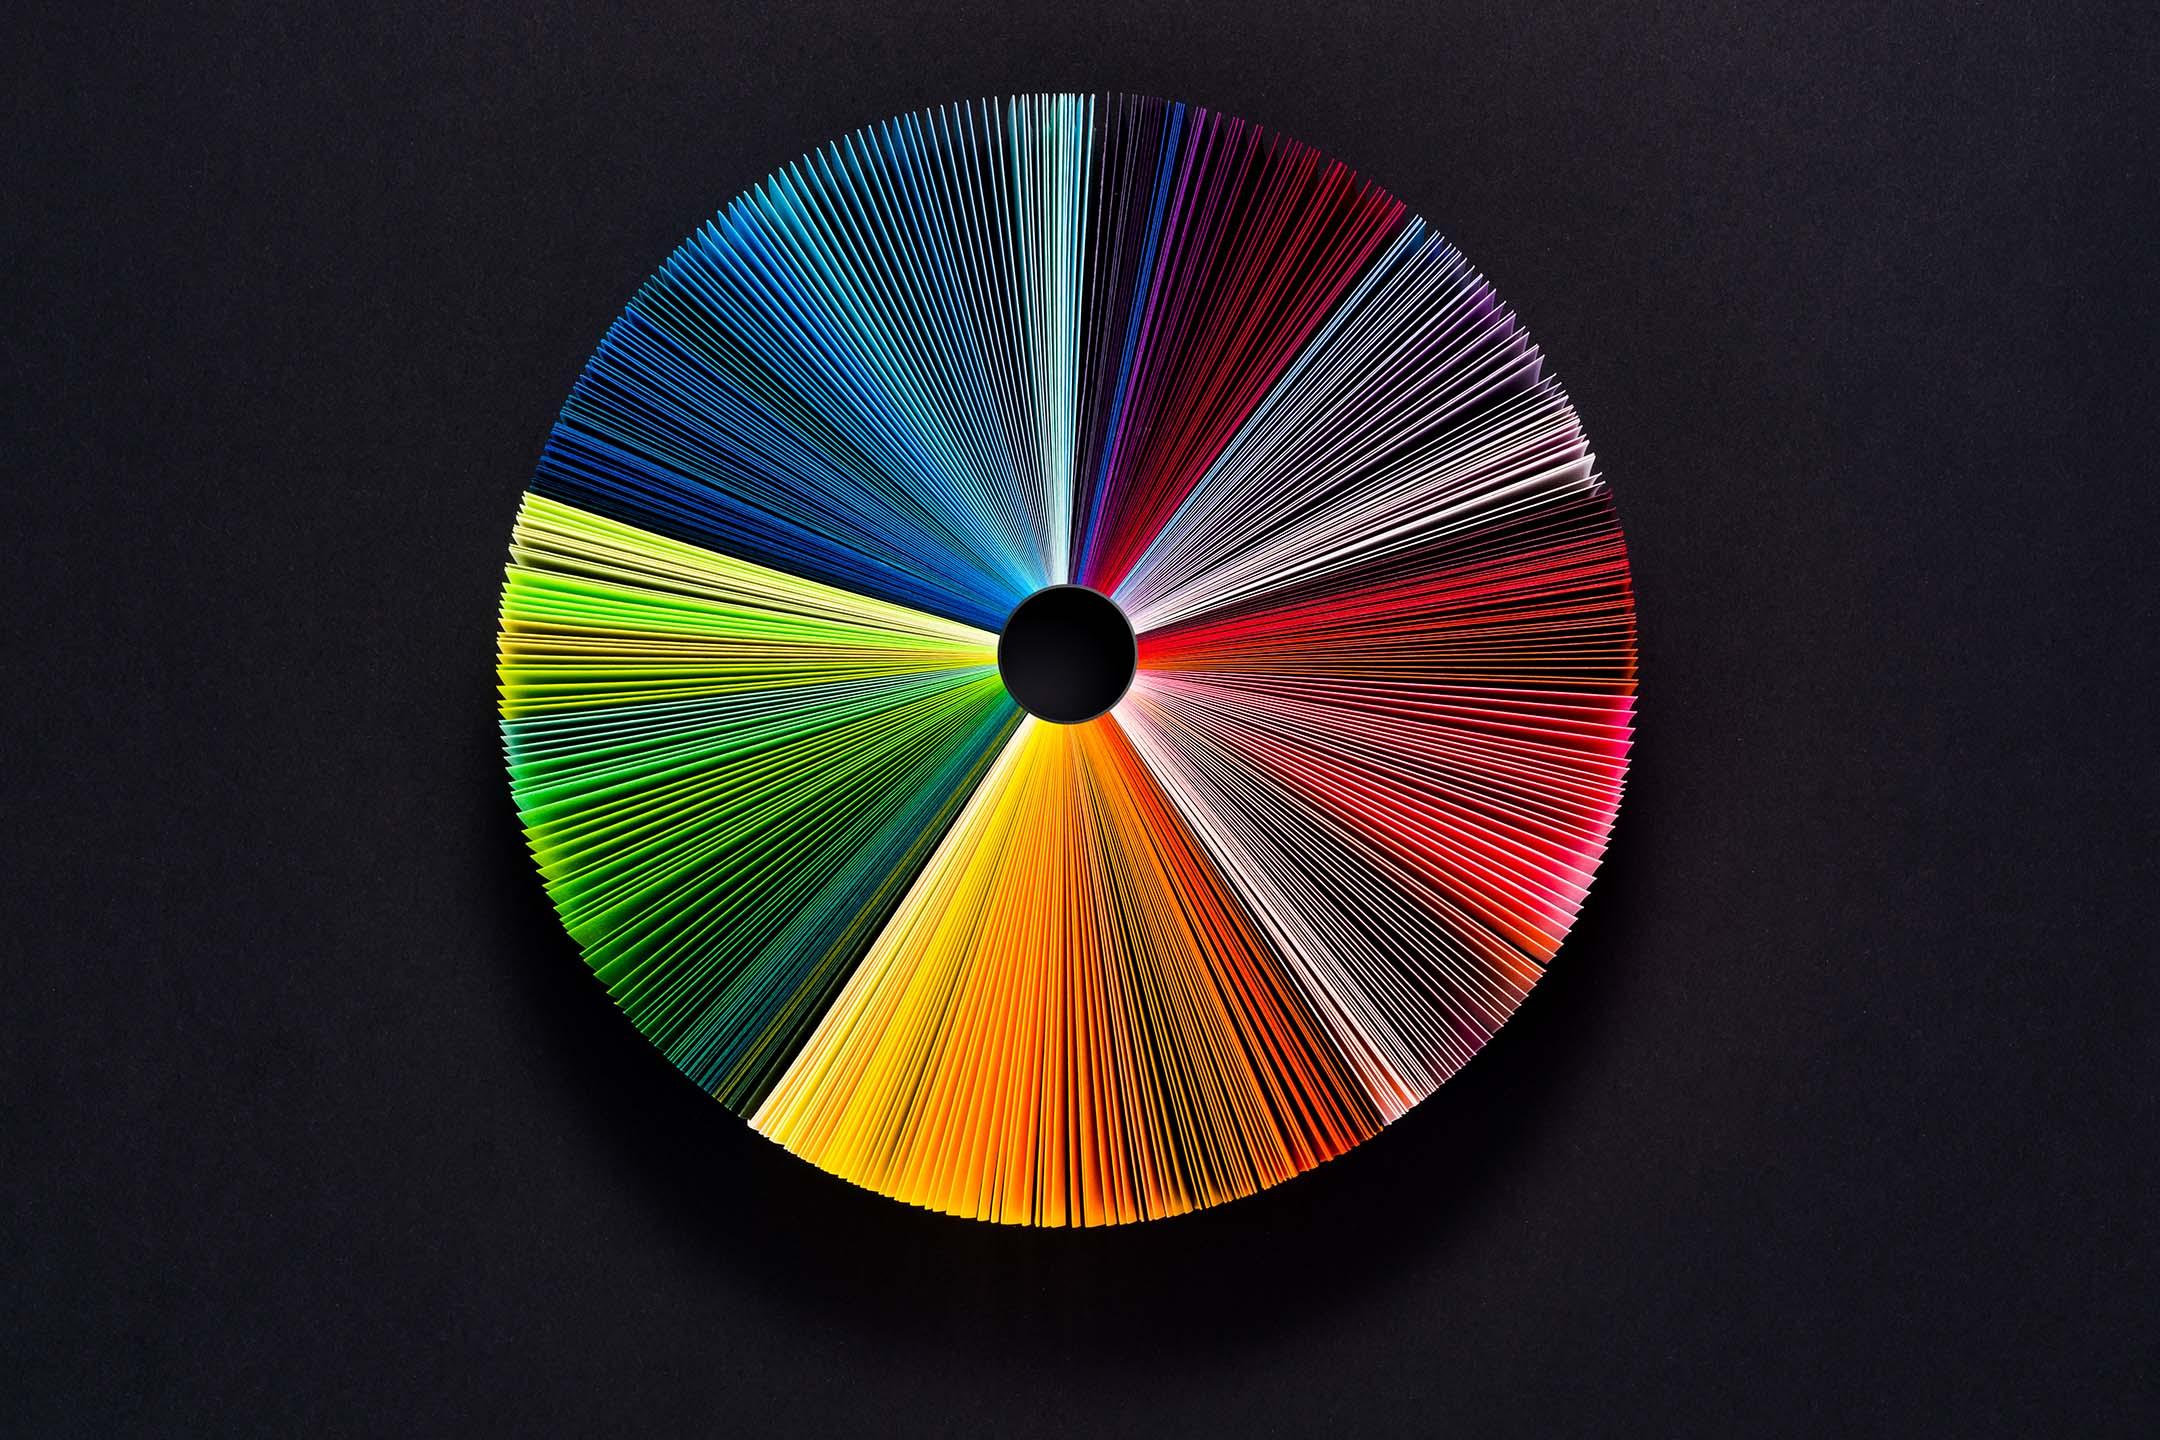 不同顏色的紙頁。 圖:Getty Images